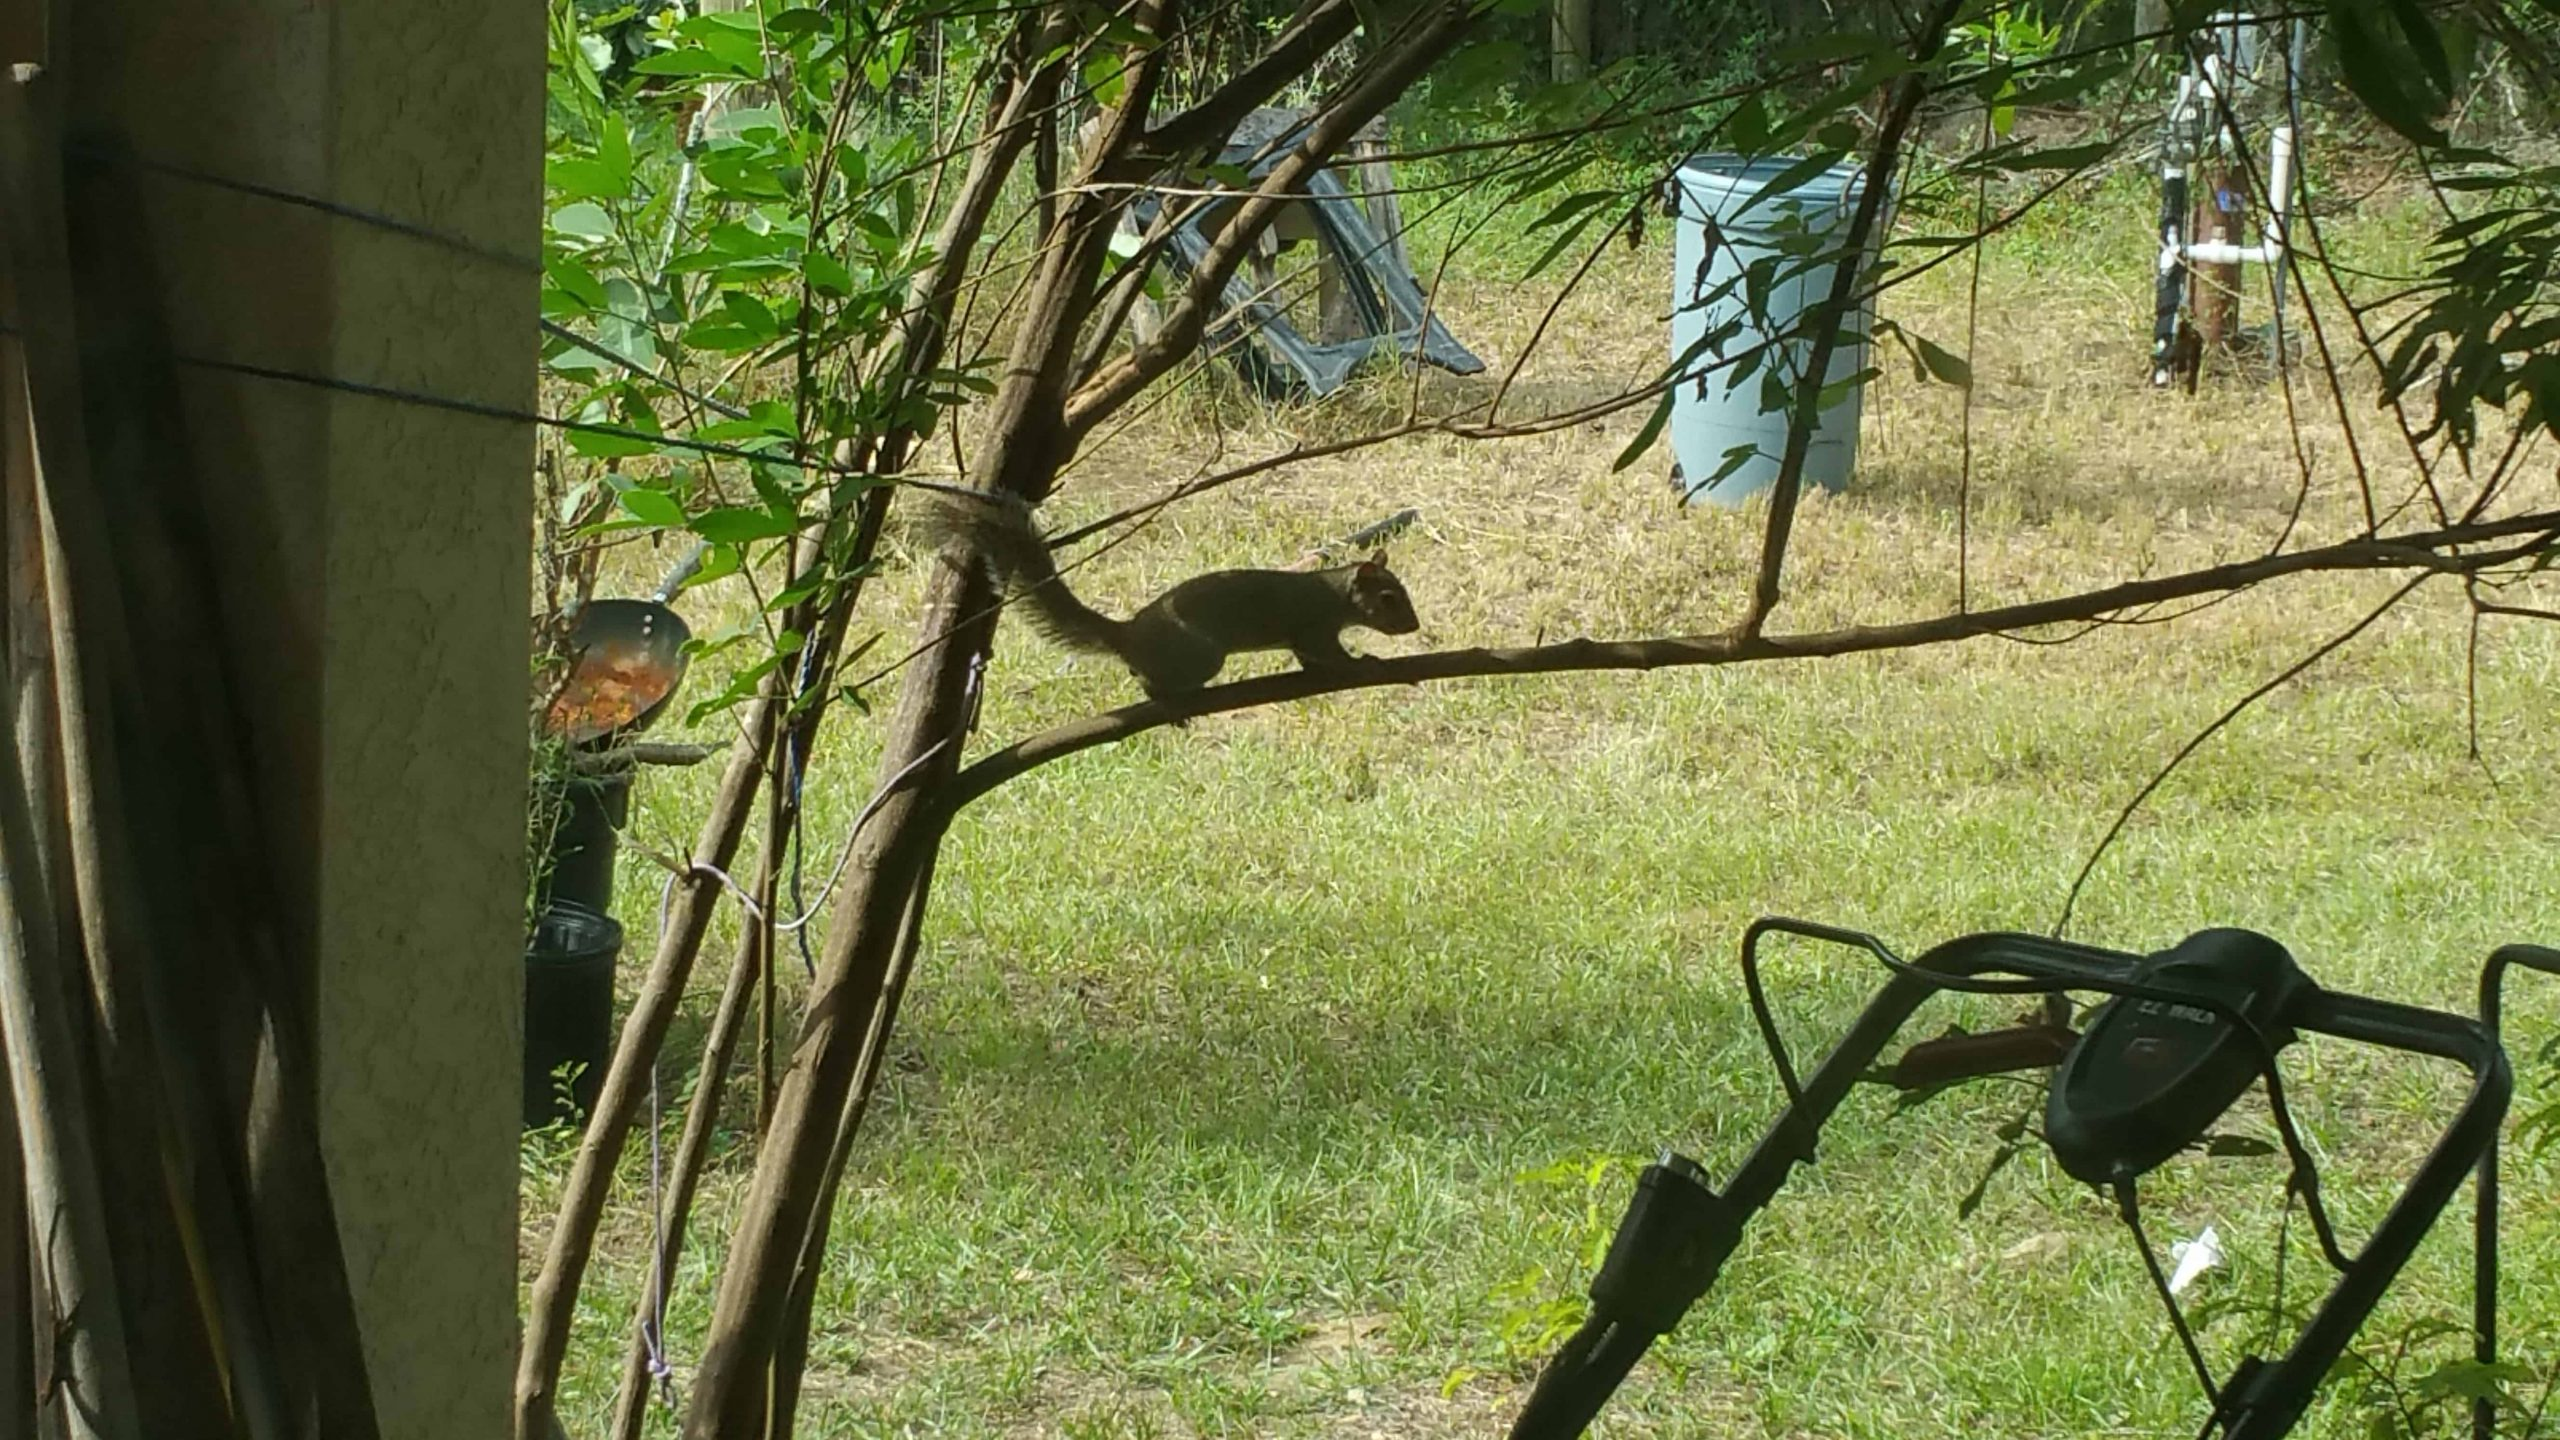 Squirrel - December 6, 2017 - 9